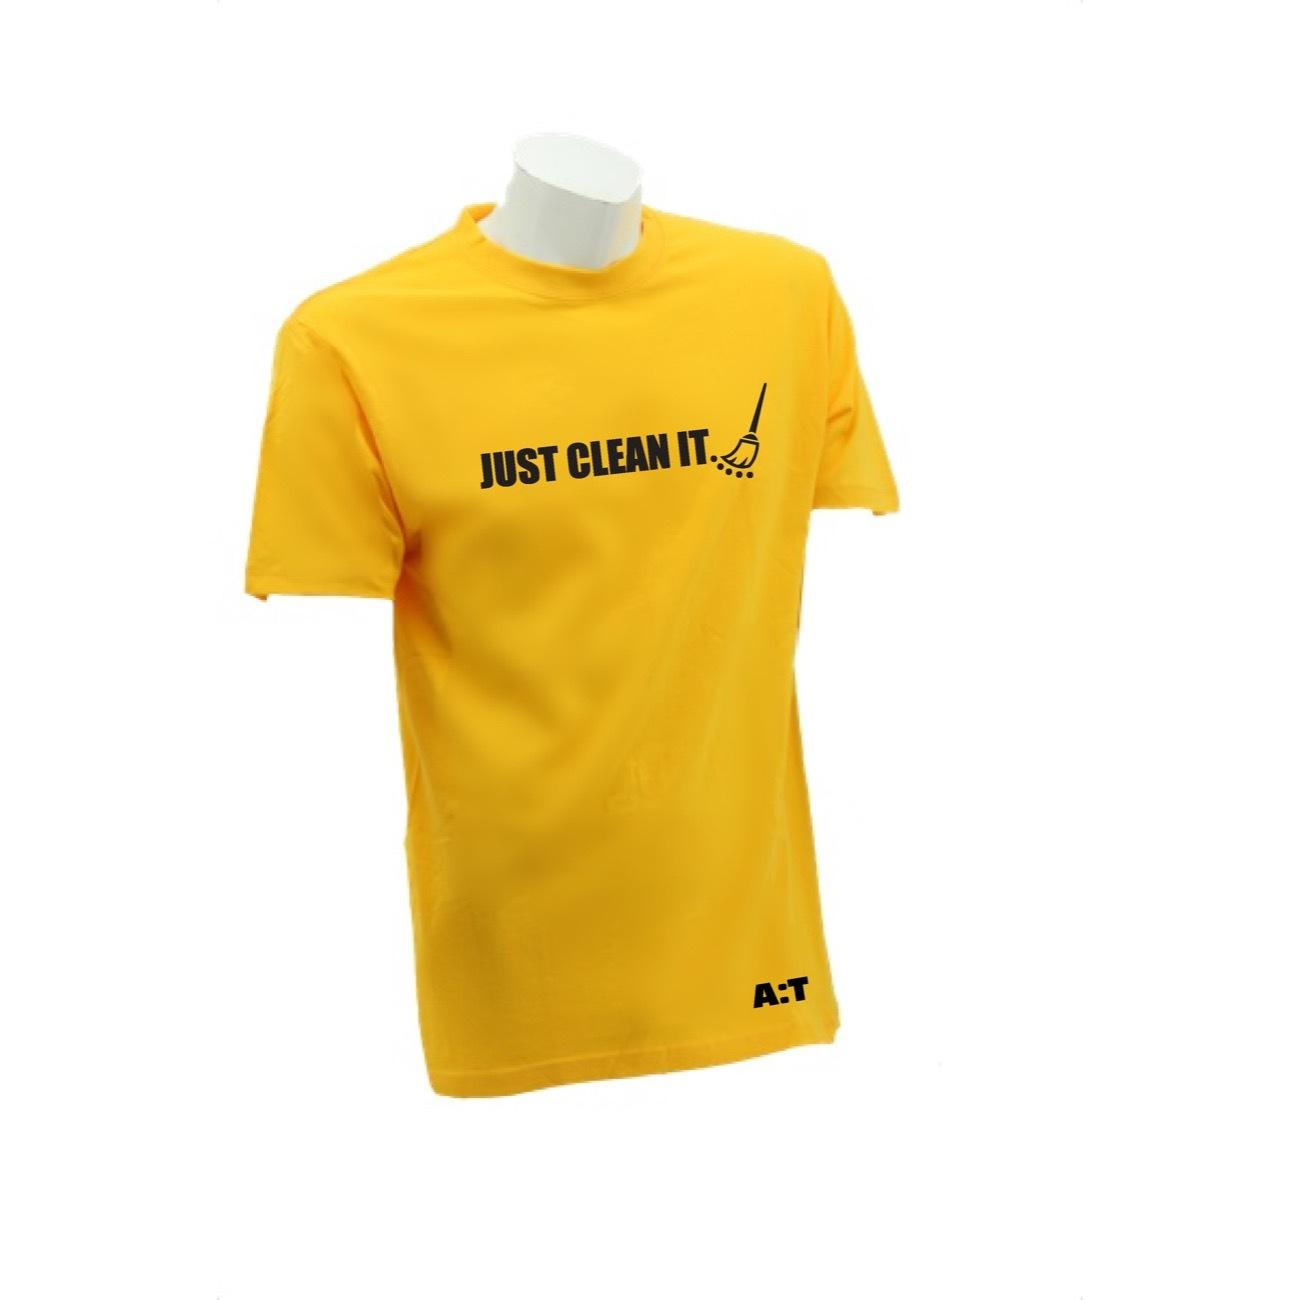 【 Bersih 】[ Bersih 5 ] Limited Edition Just Clean It T- Shirt Design for  Unisex